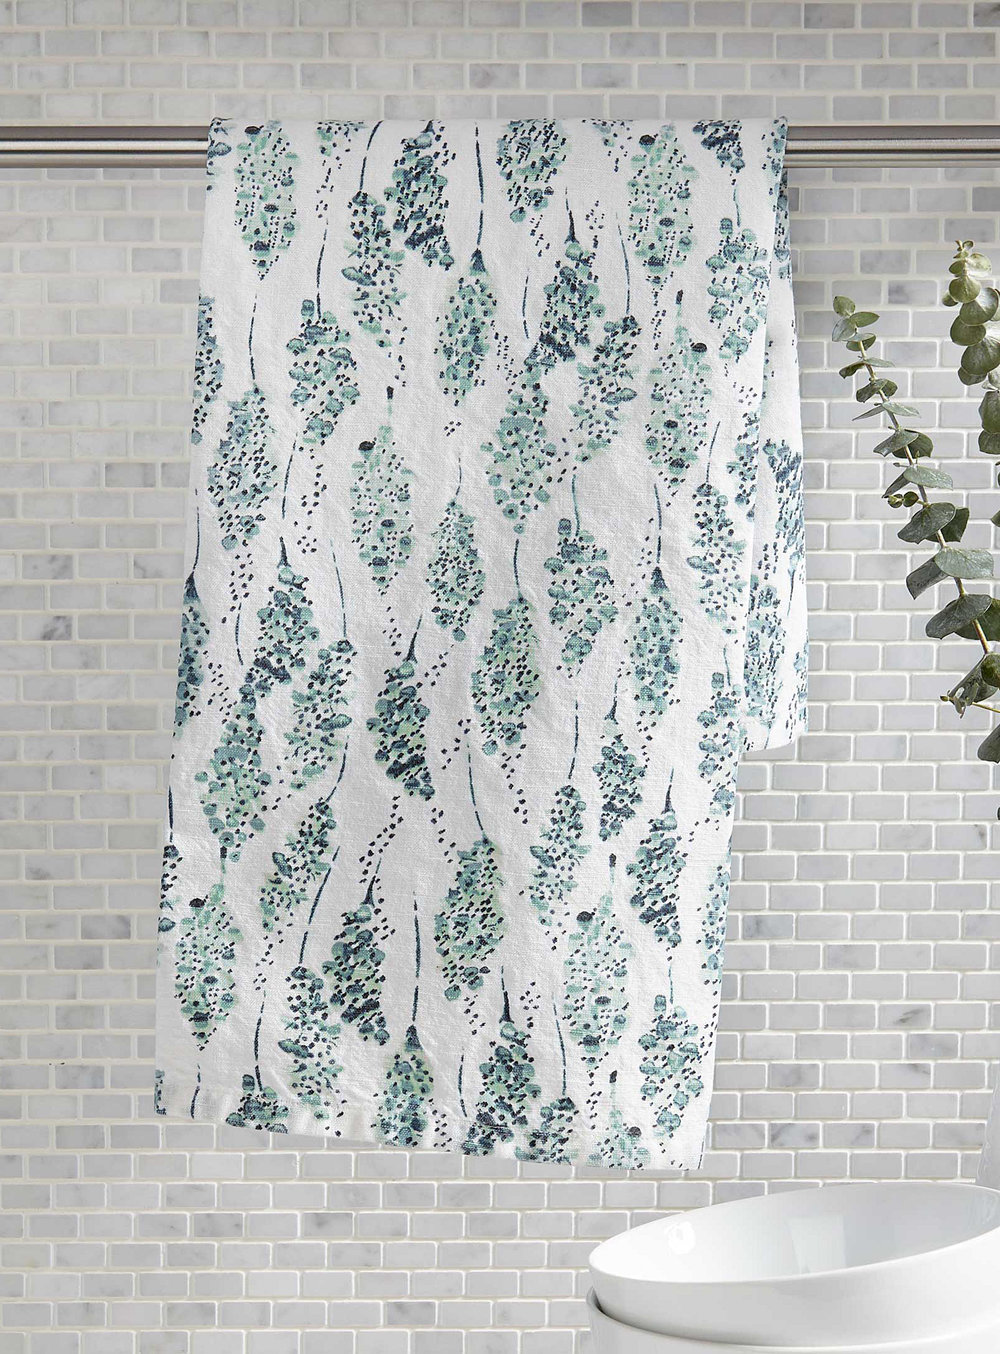 2. Hyacinth Tea Towel